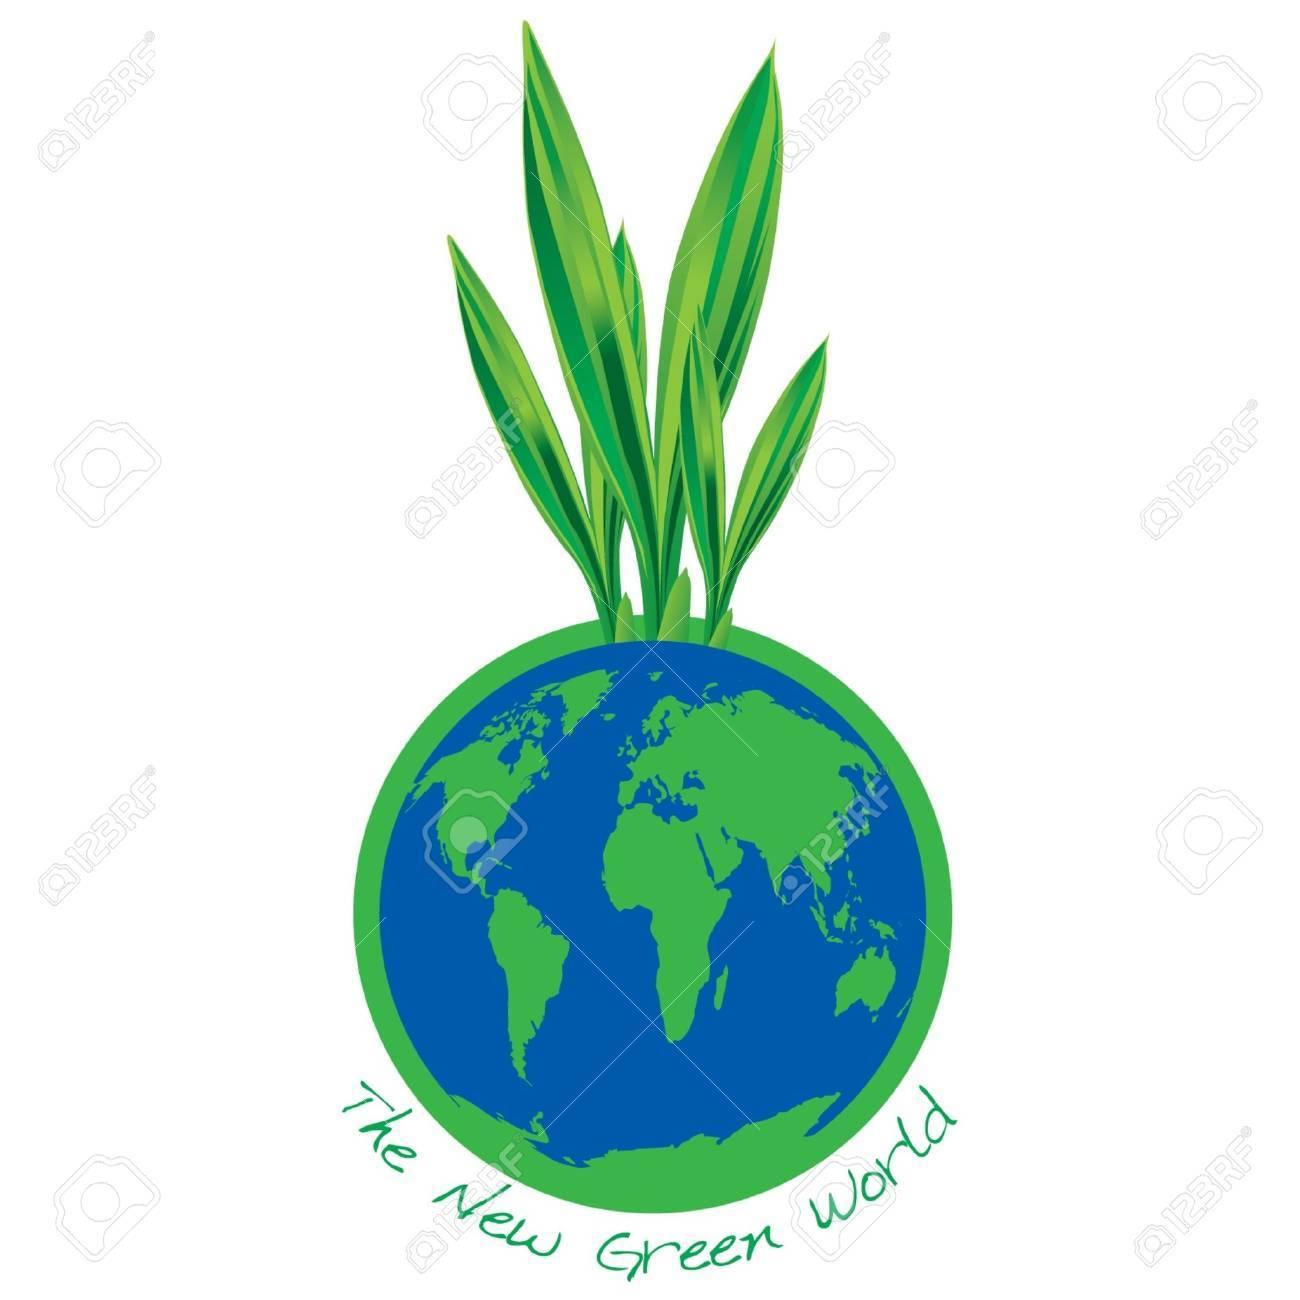 New green world Stock Vector - 13568433